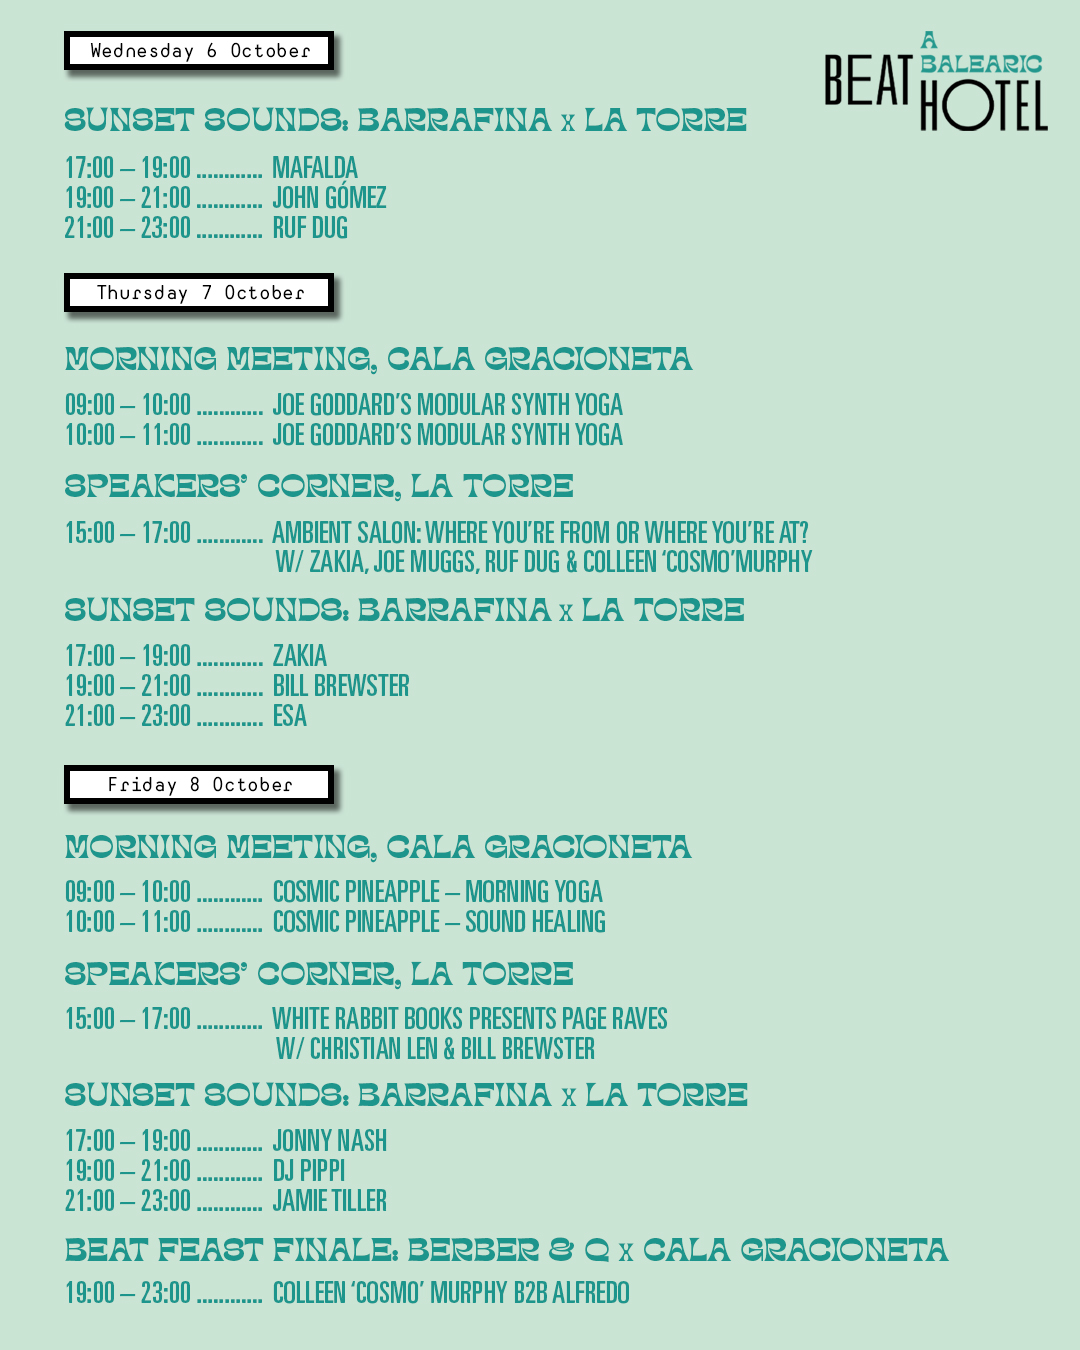 A Balearic Beat Hotel Lineup